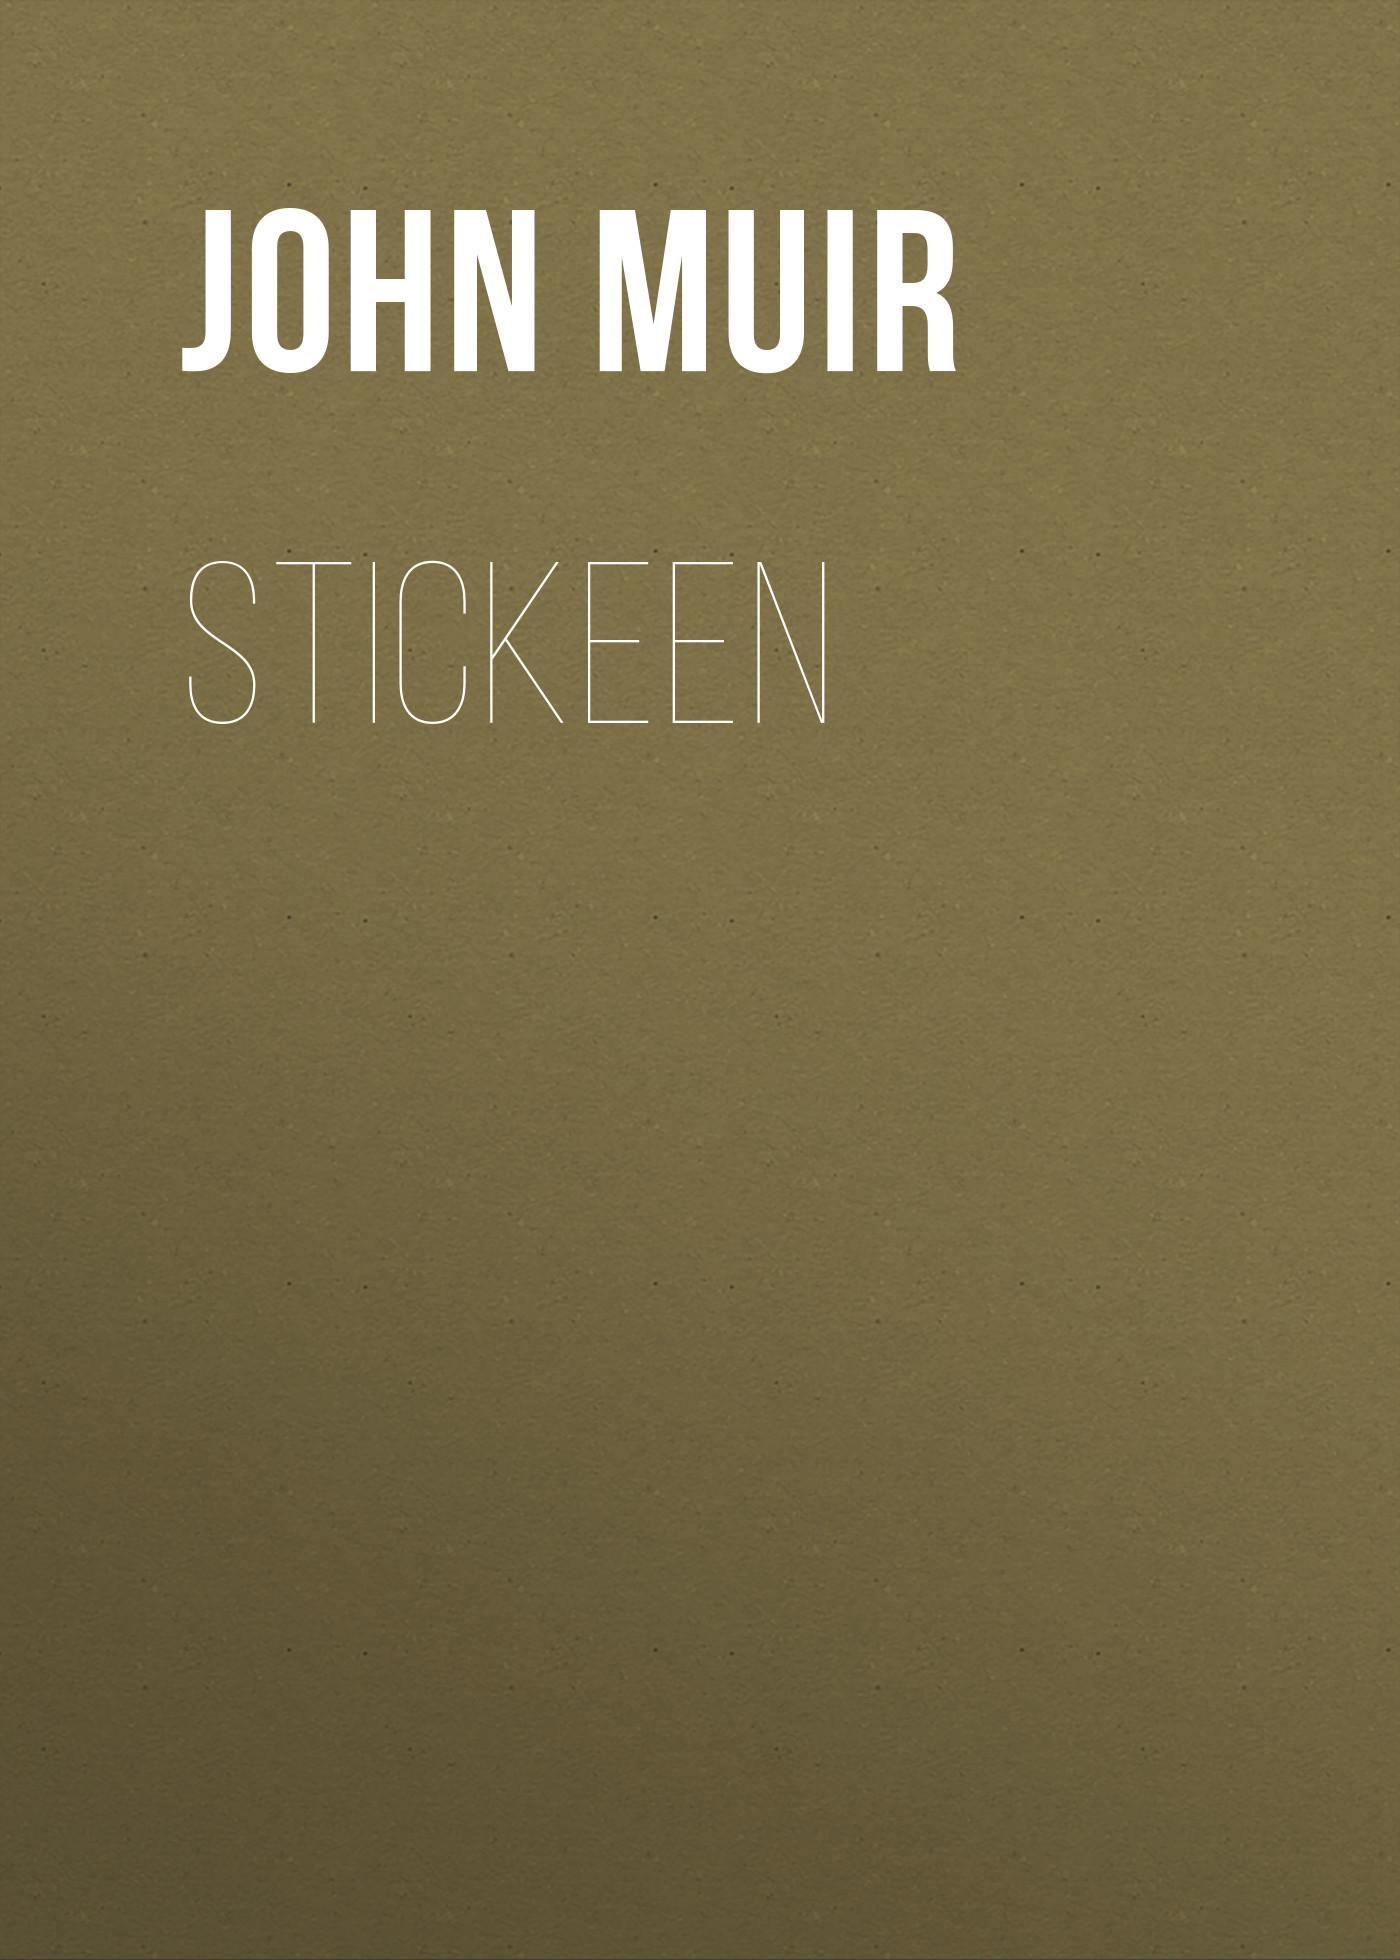 цена на John Muir Stickeen